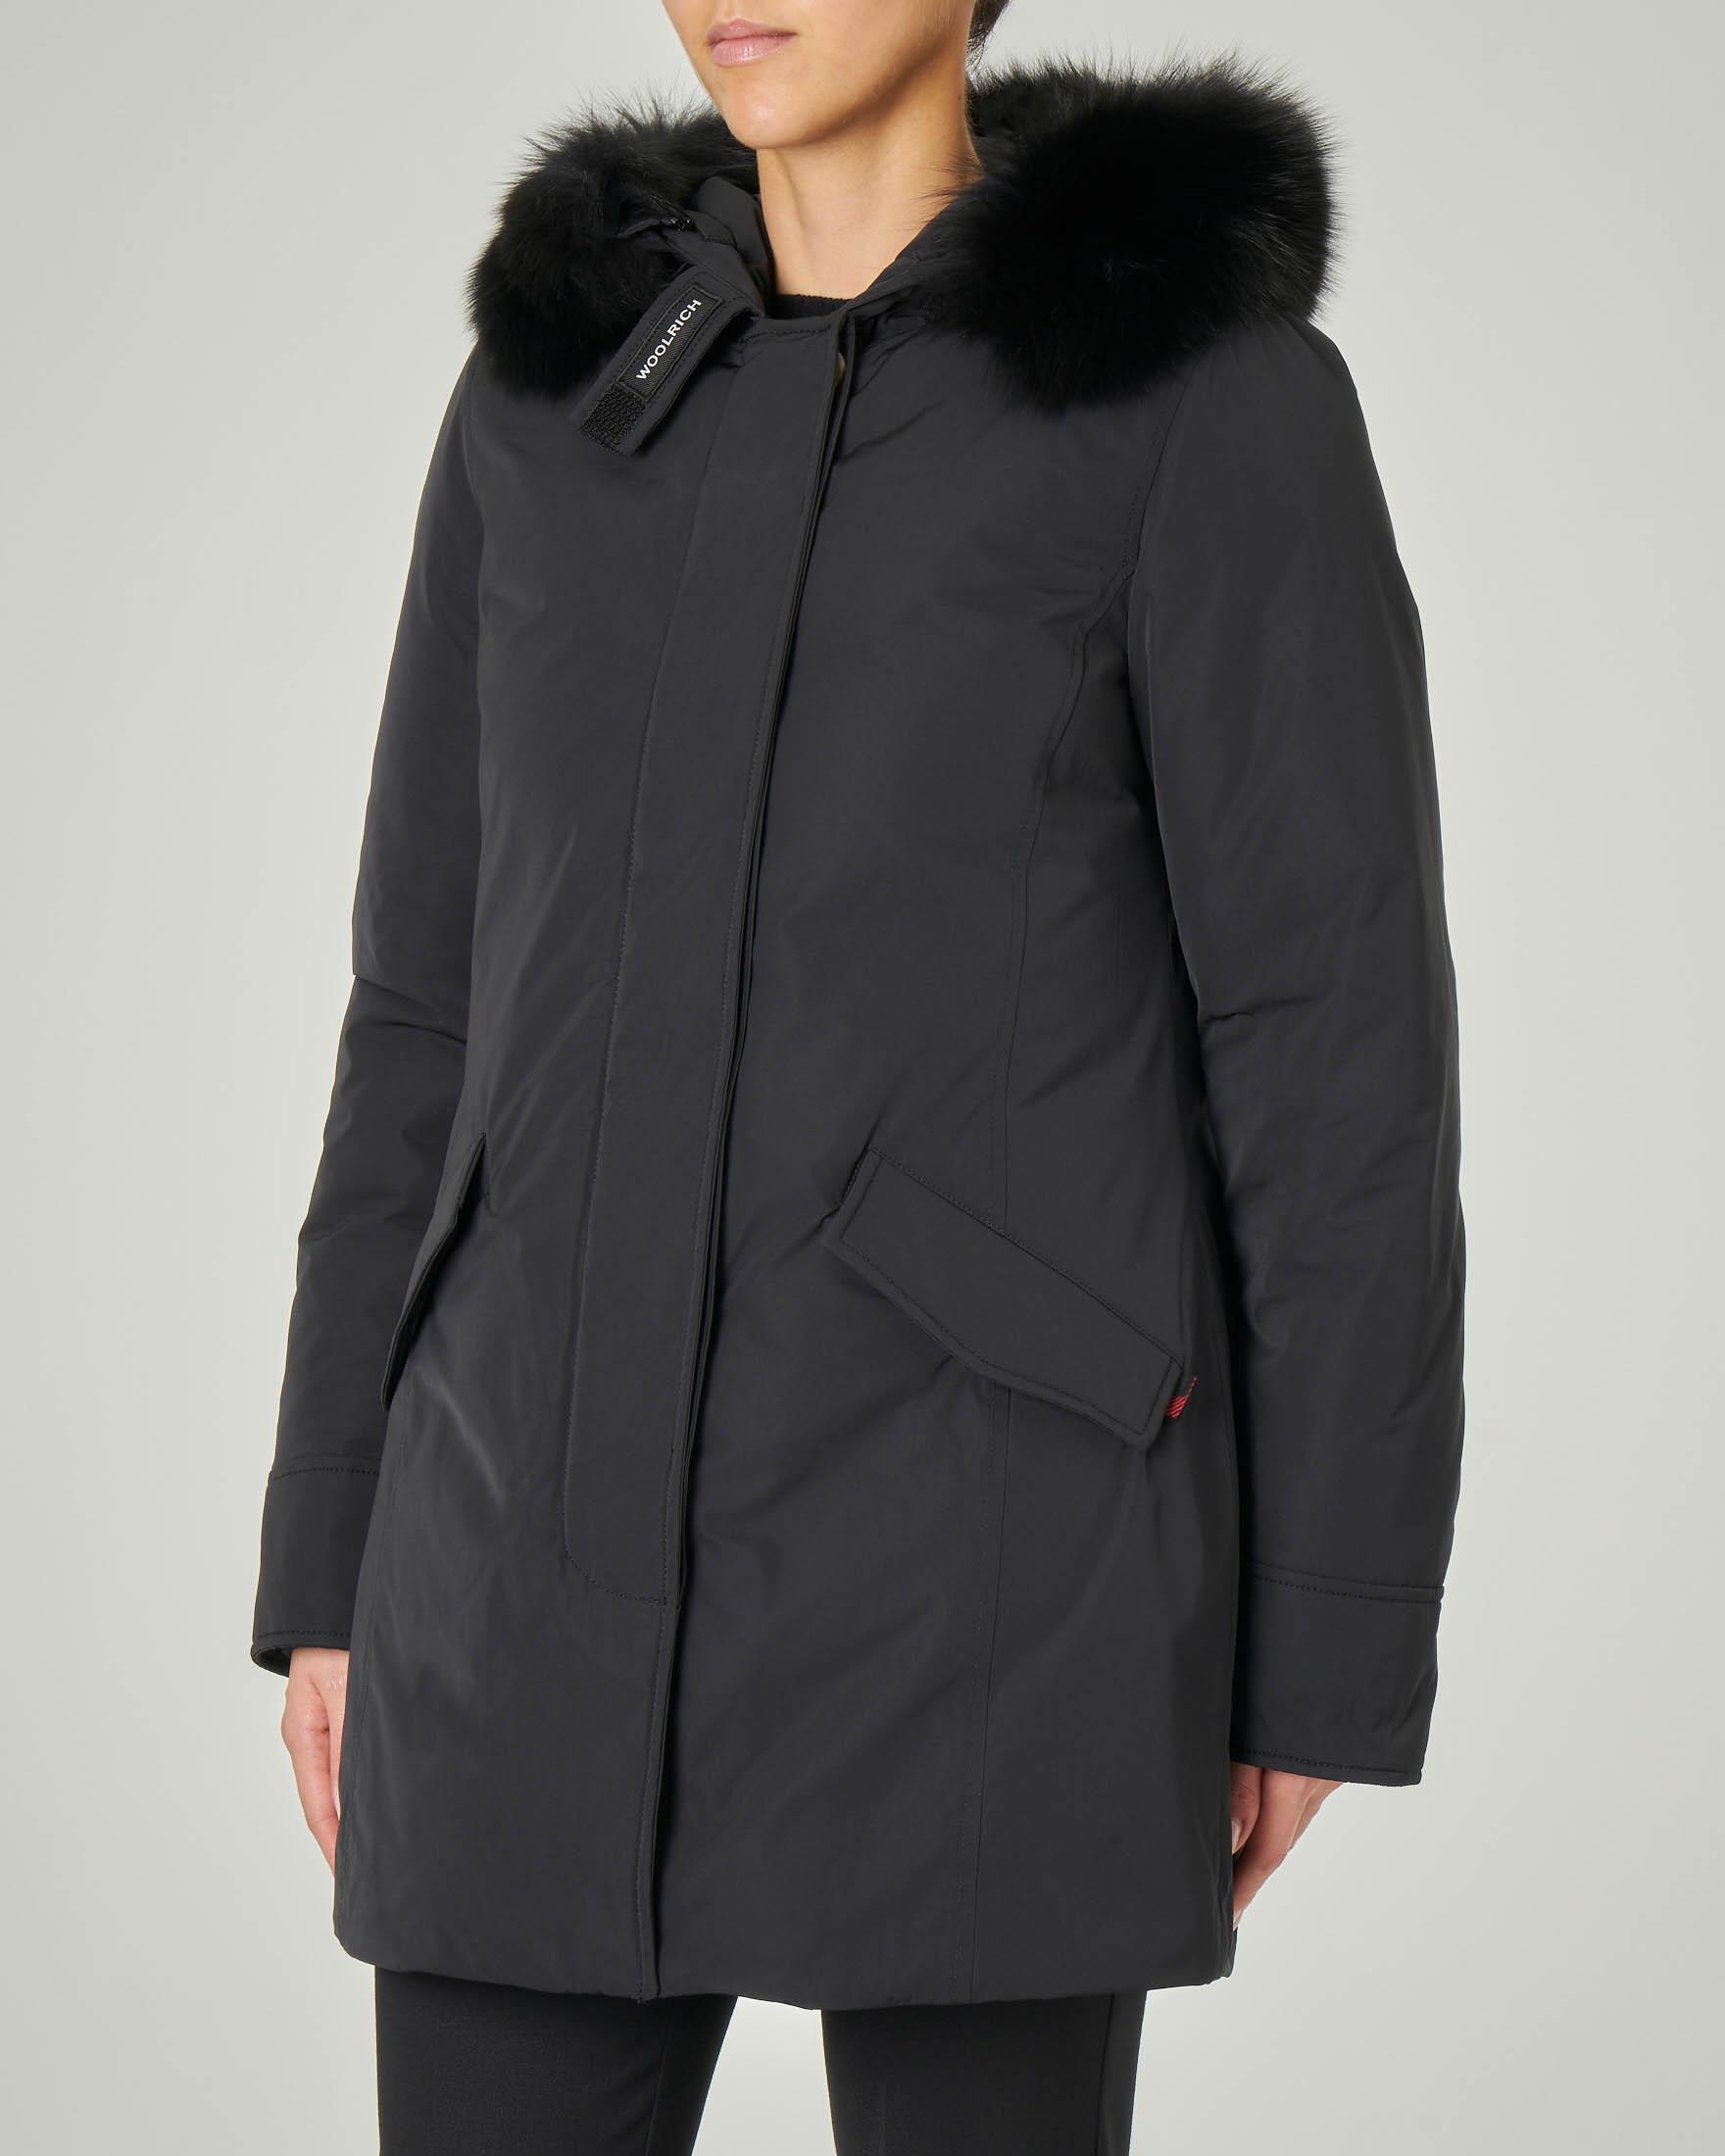 W'S Luxury Arctic Parka Fox nero con bordatura in volpe